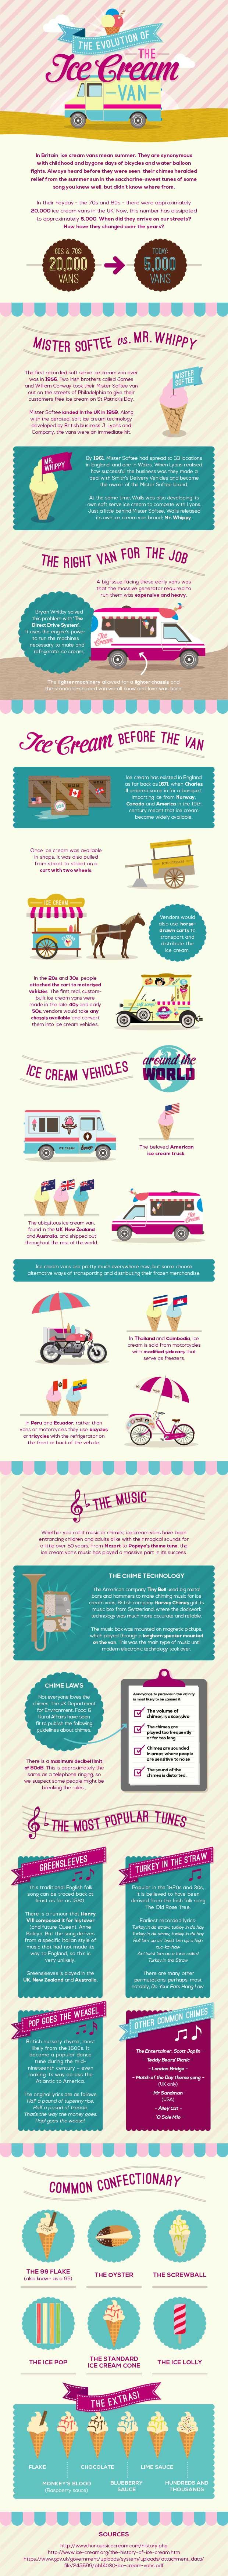 Ice Cream Van History - Fab Food 4 All